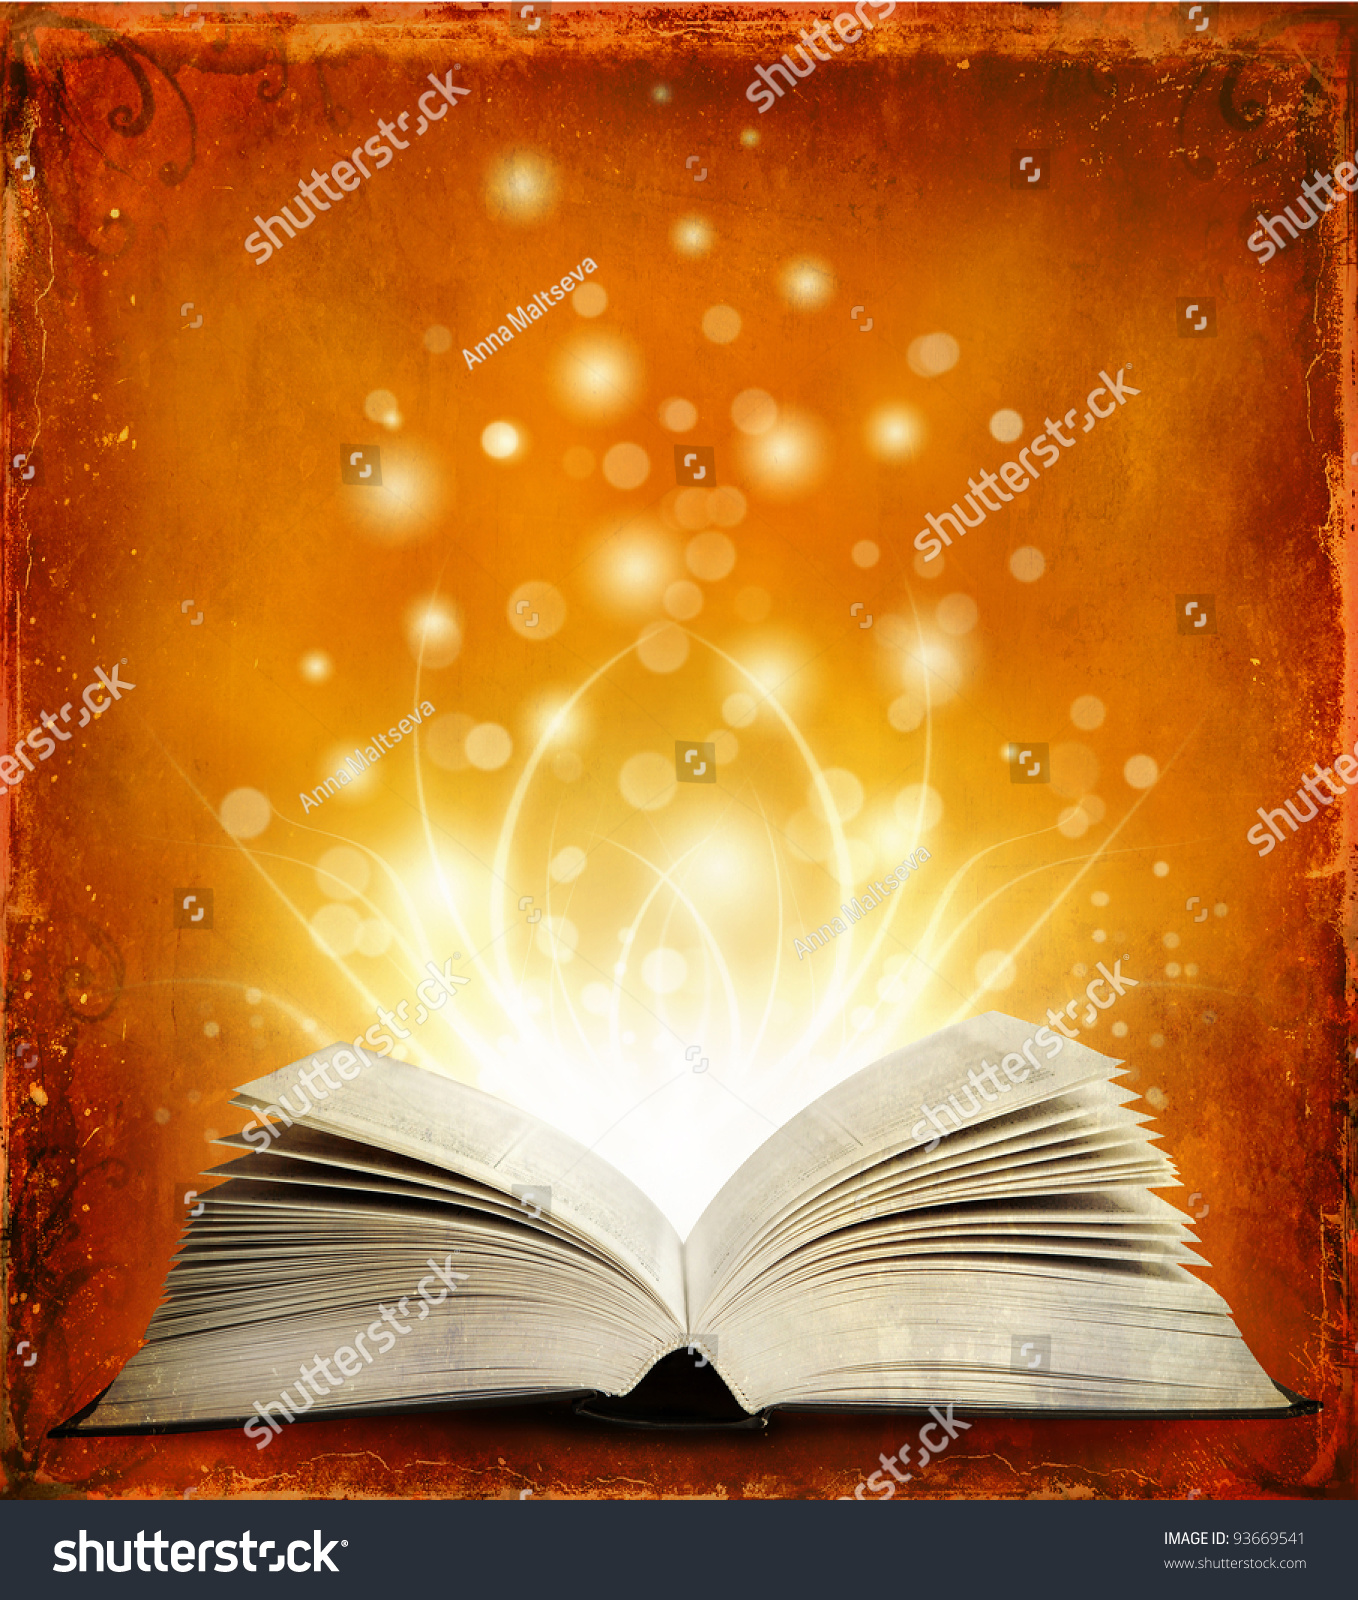 book opened magic book magic light stock photo shutterstock